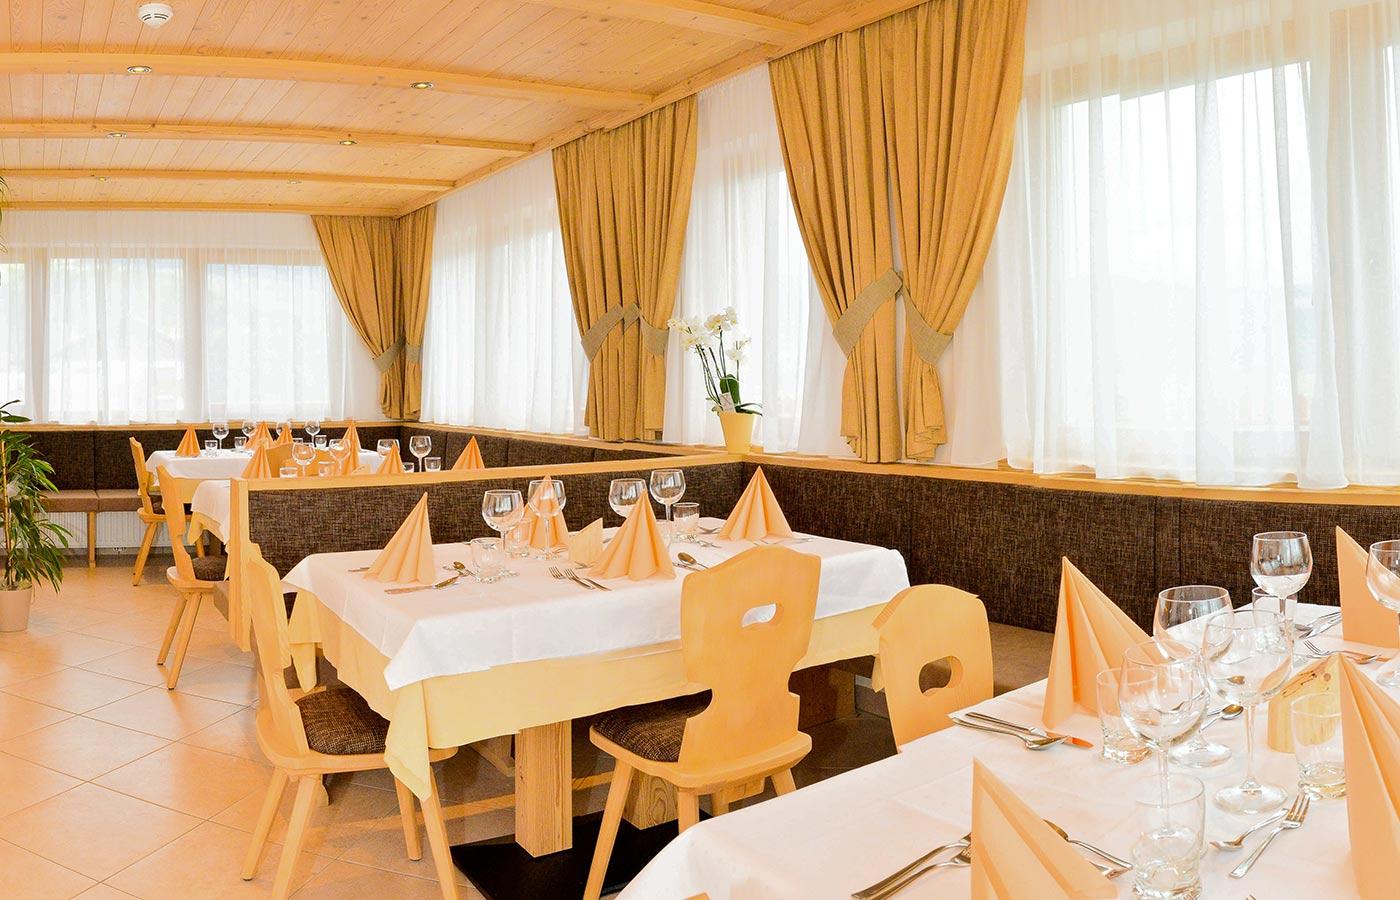 La Sala Da Pranzo Dell'Hotel Brunnerhof In Alto Adige: Vacanze In  #B87413 1400 900 Sala Da Pranzo Del Quirinale